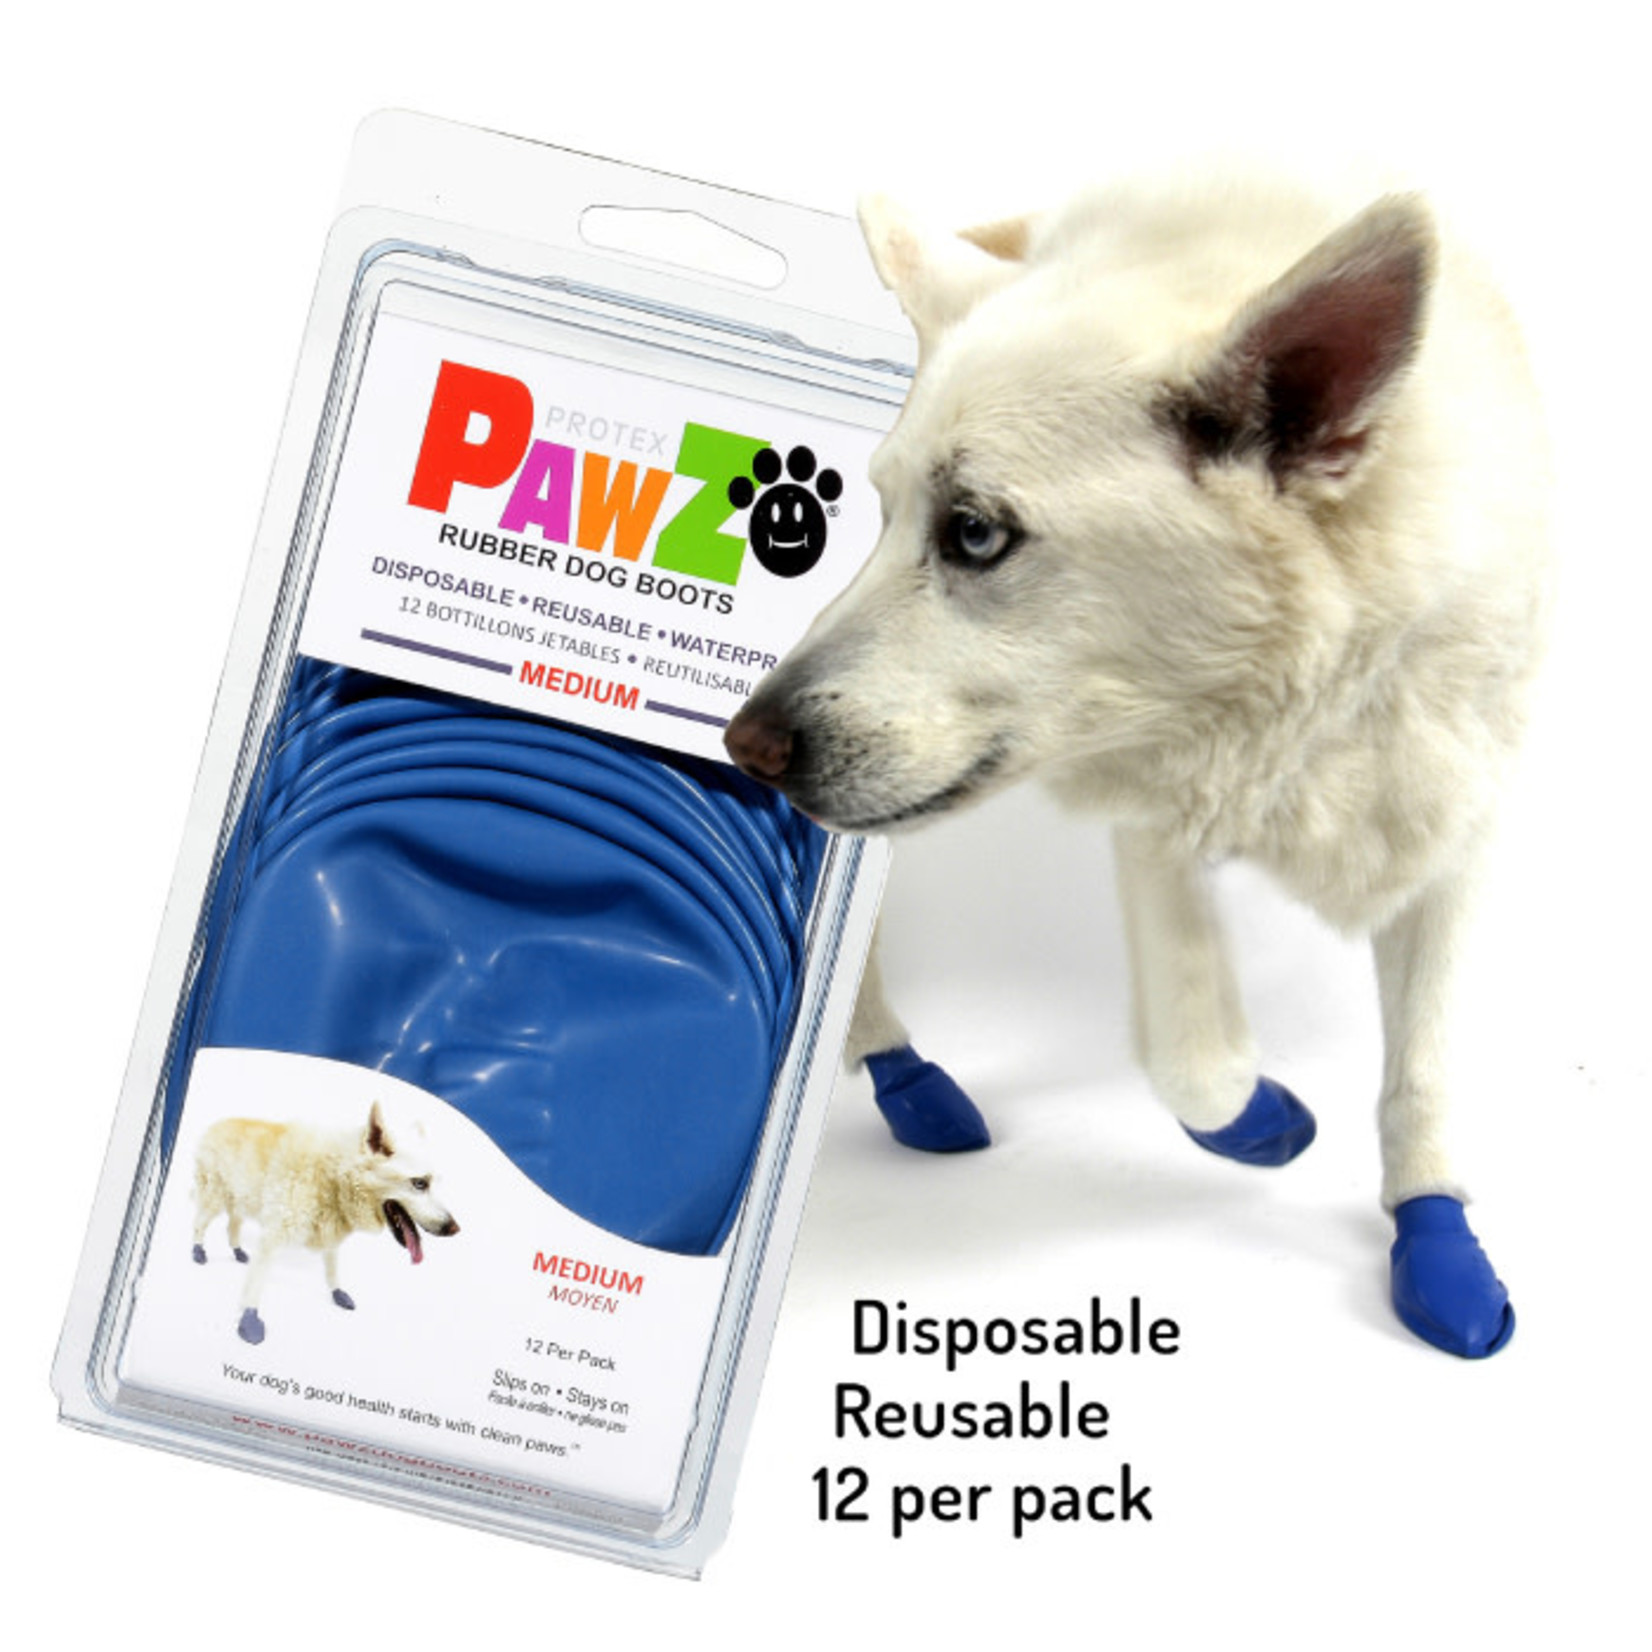 PAWZ Dog Boots Blue Medium 12 Pack